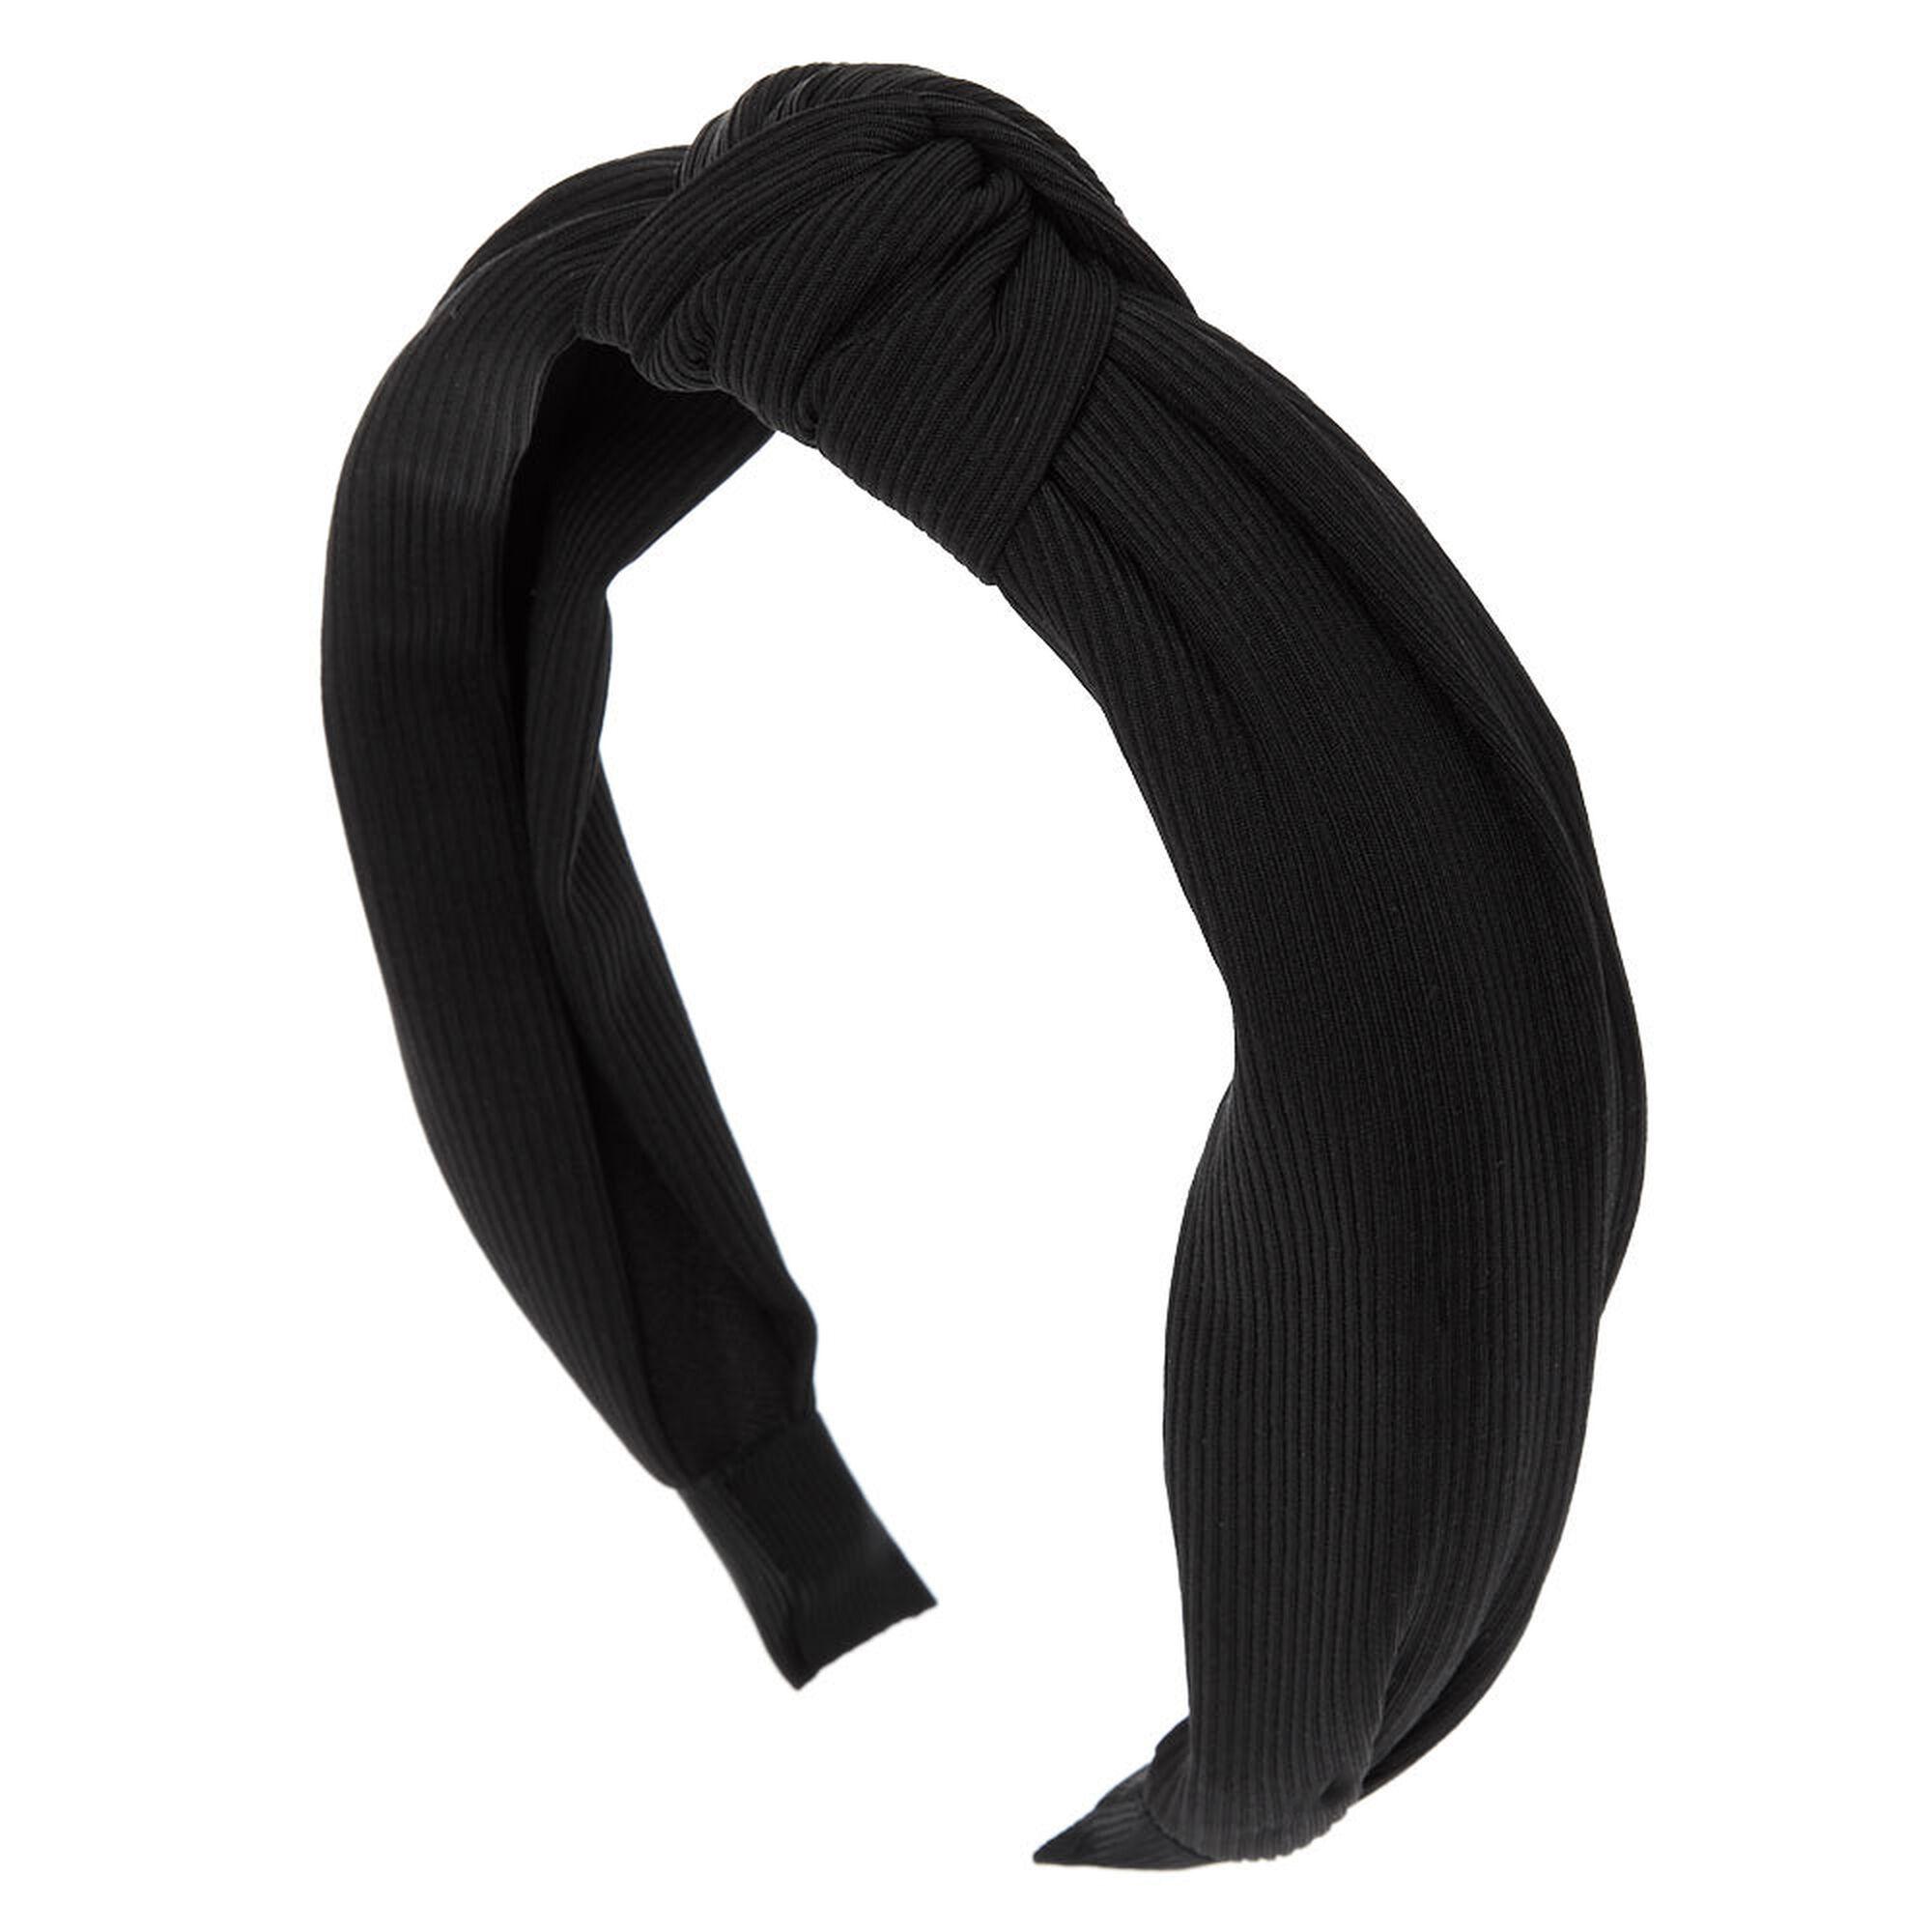 clares acessories headband